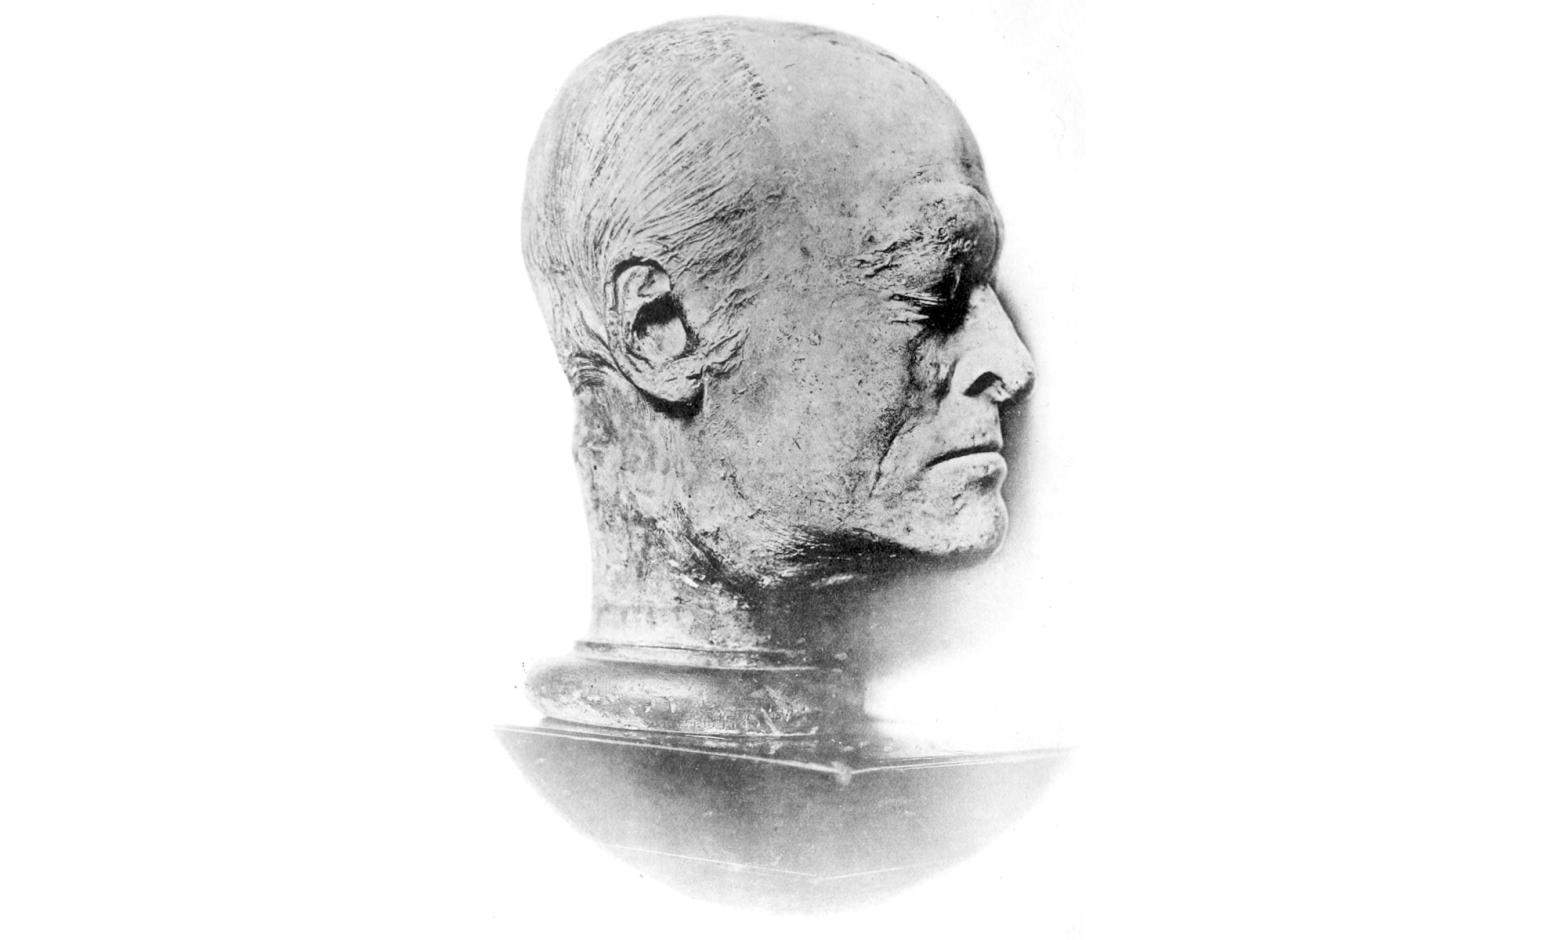 Bust of William Blake made by James de Ville c. 1807. Public domain.